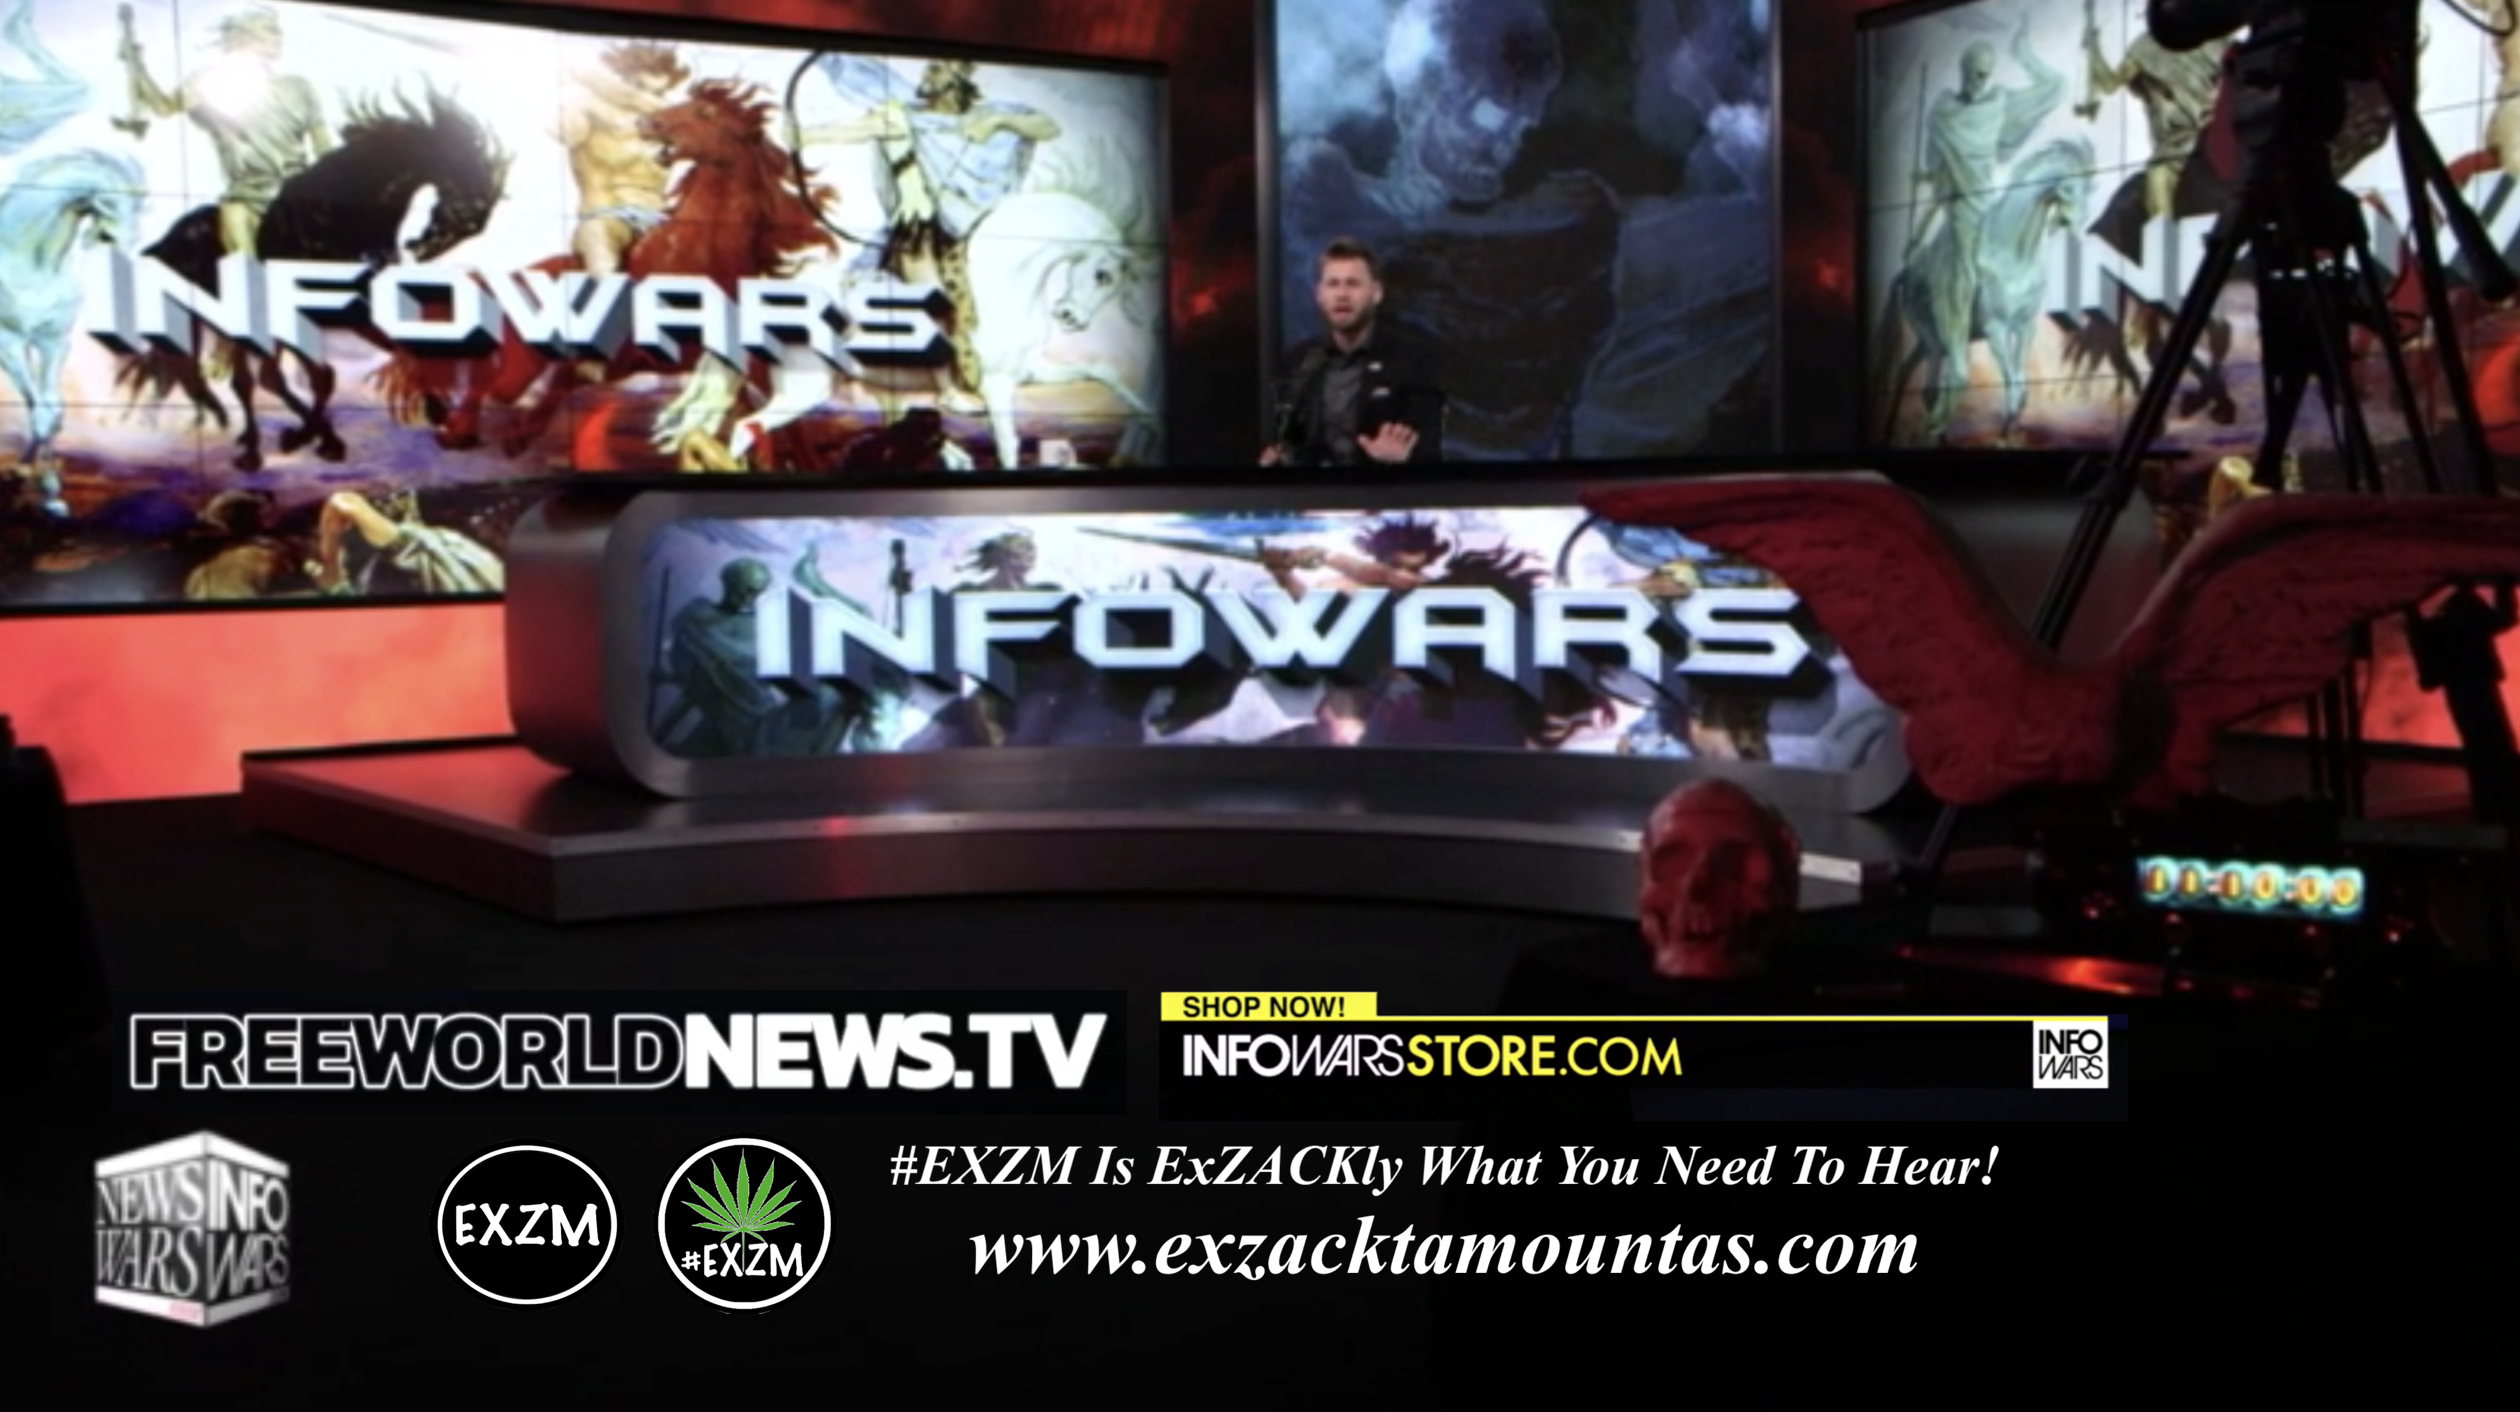 Owen Shroyer Alex Jones Live In Infowars Studio Free World News TV EXZM Zack Mount June 22nd 2021 copy